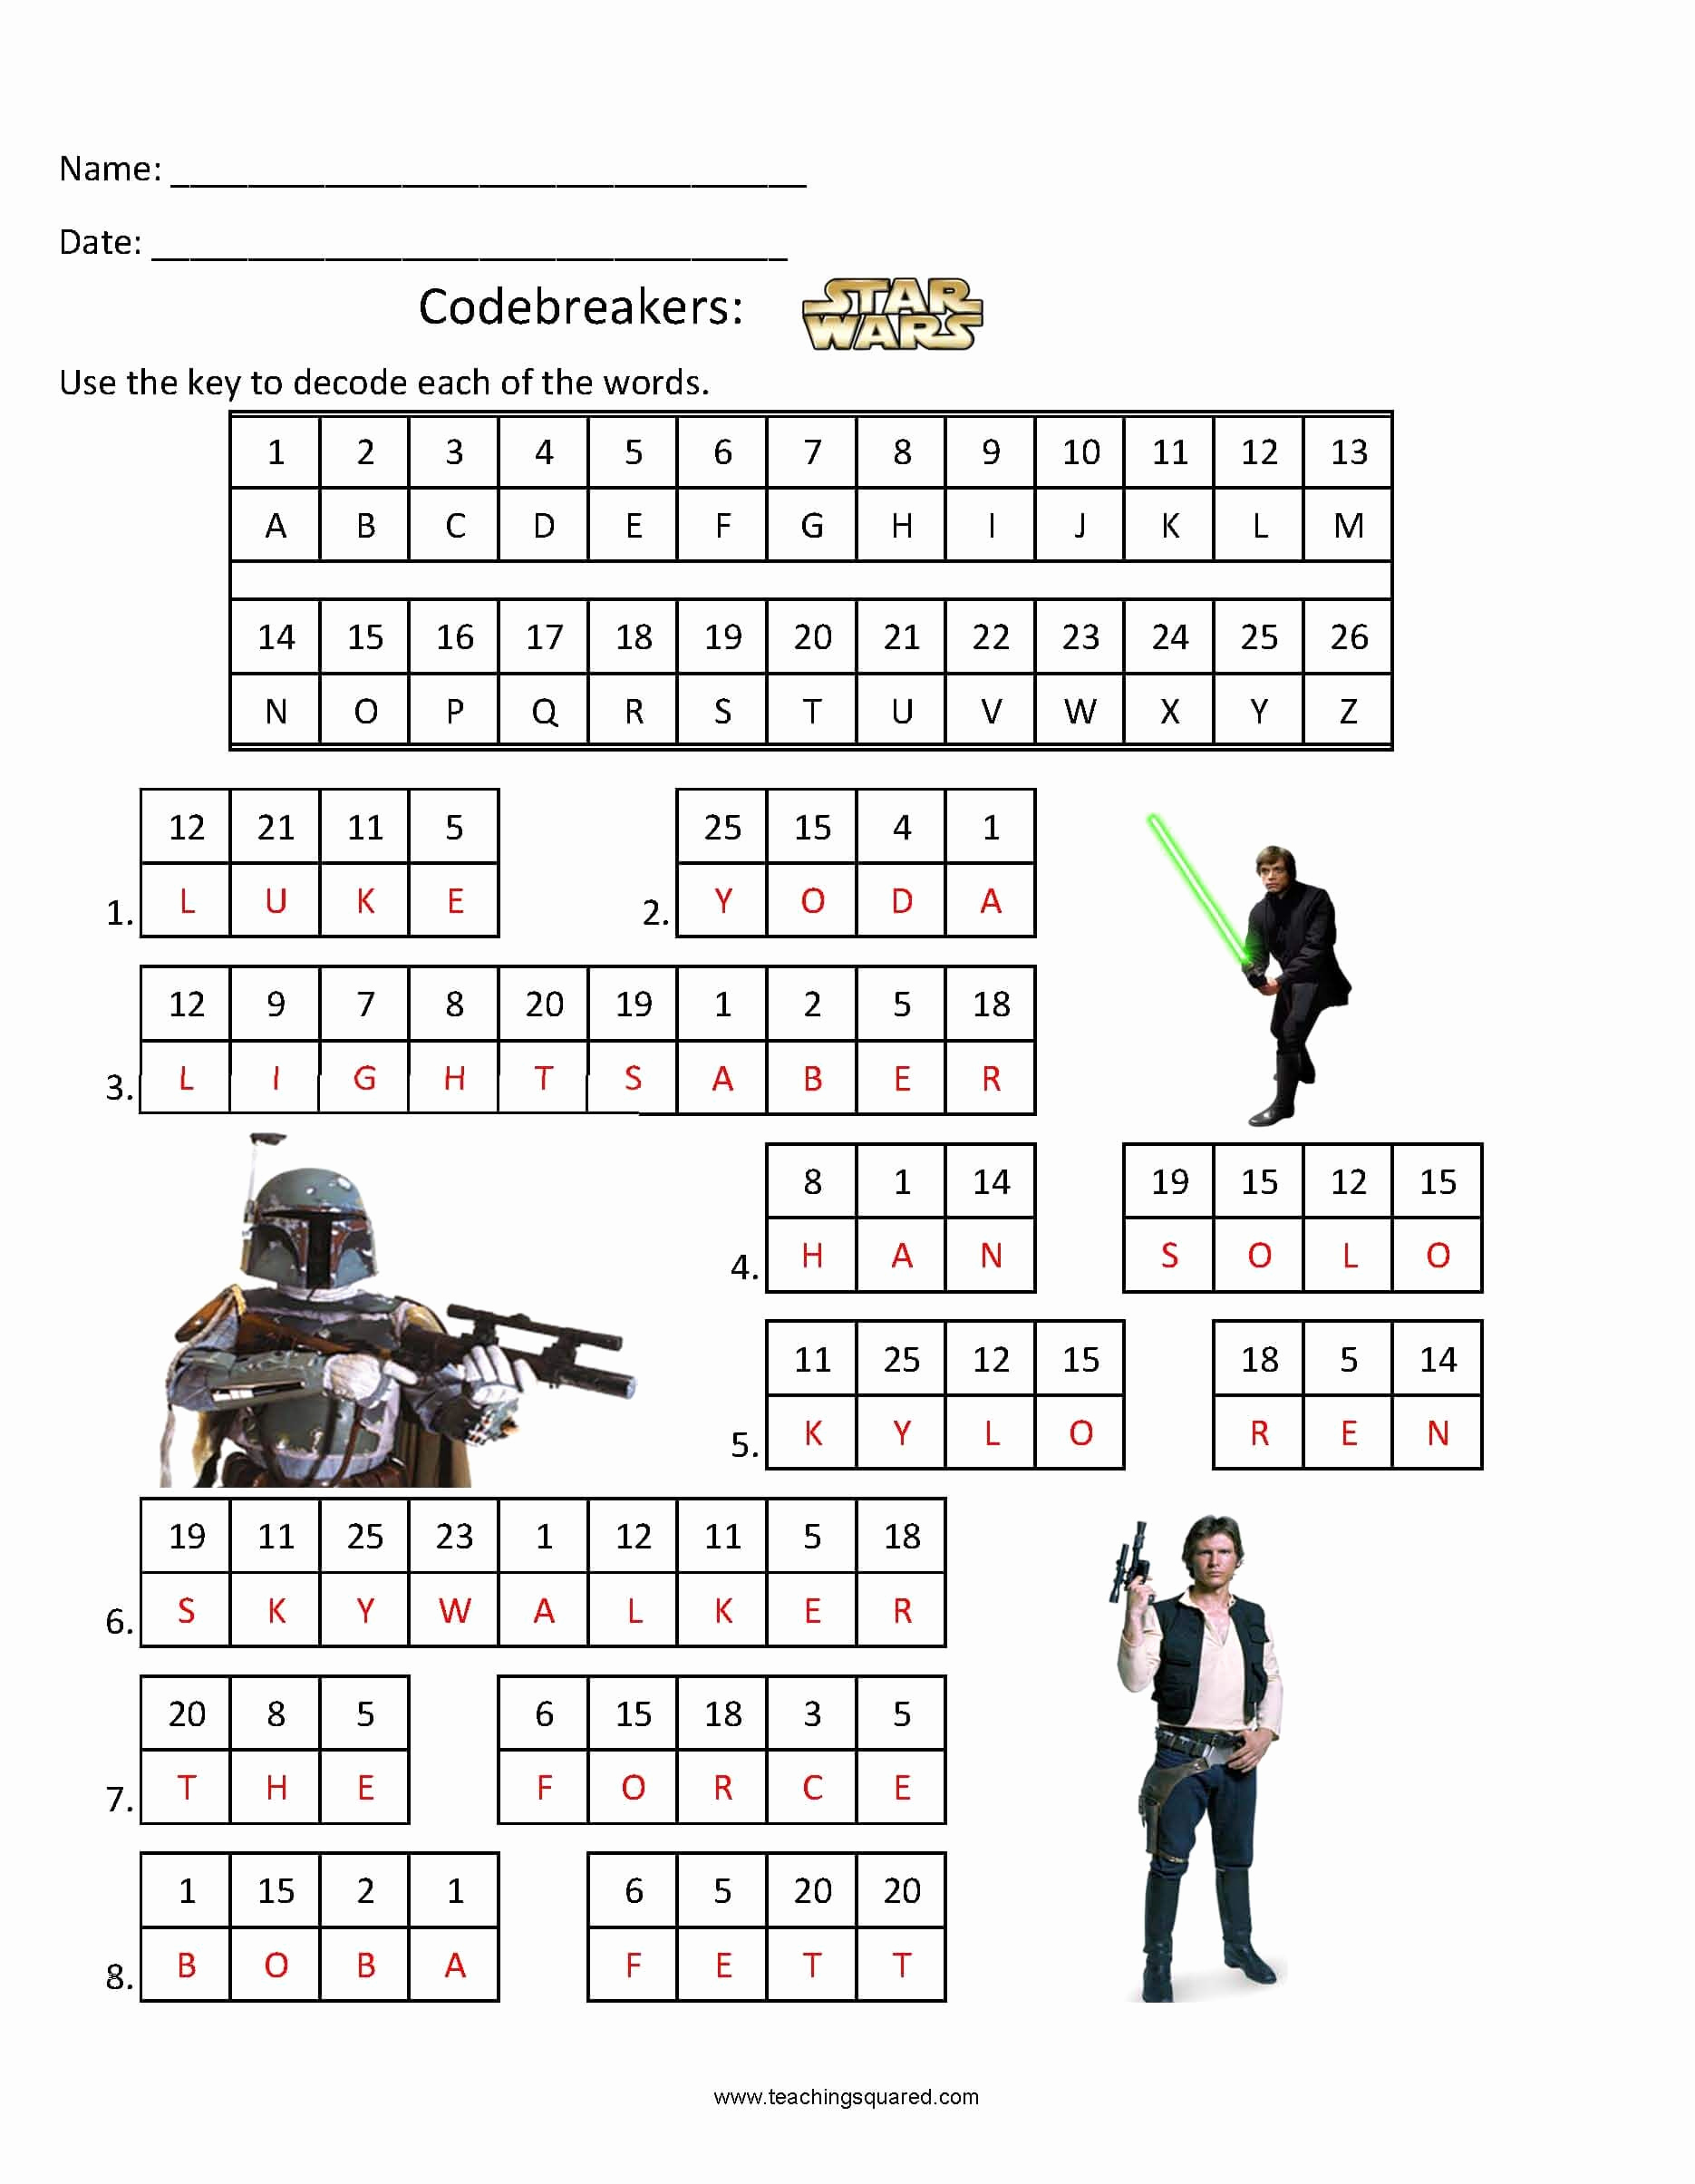 Code Breaker Worksheet Beautiful Image Result for Code Breaker Puzzle Minecraft